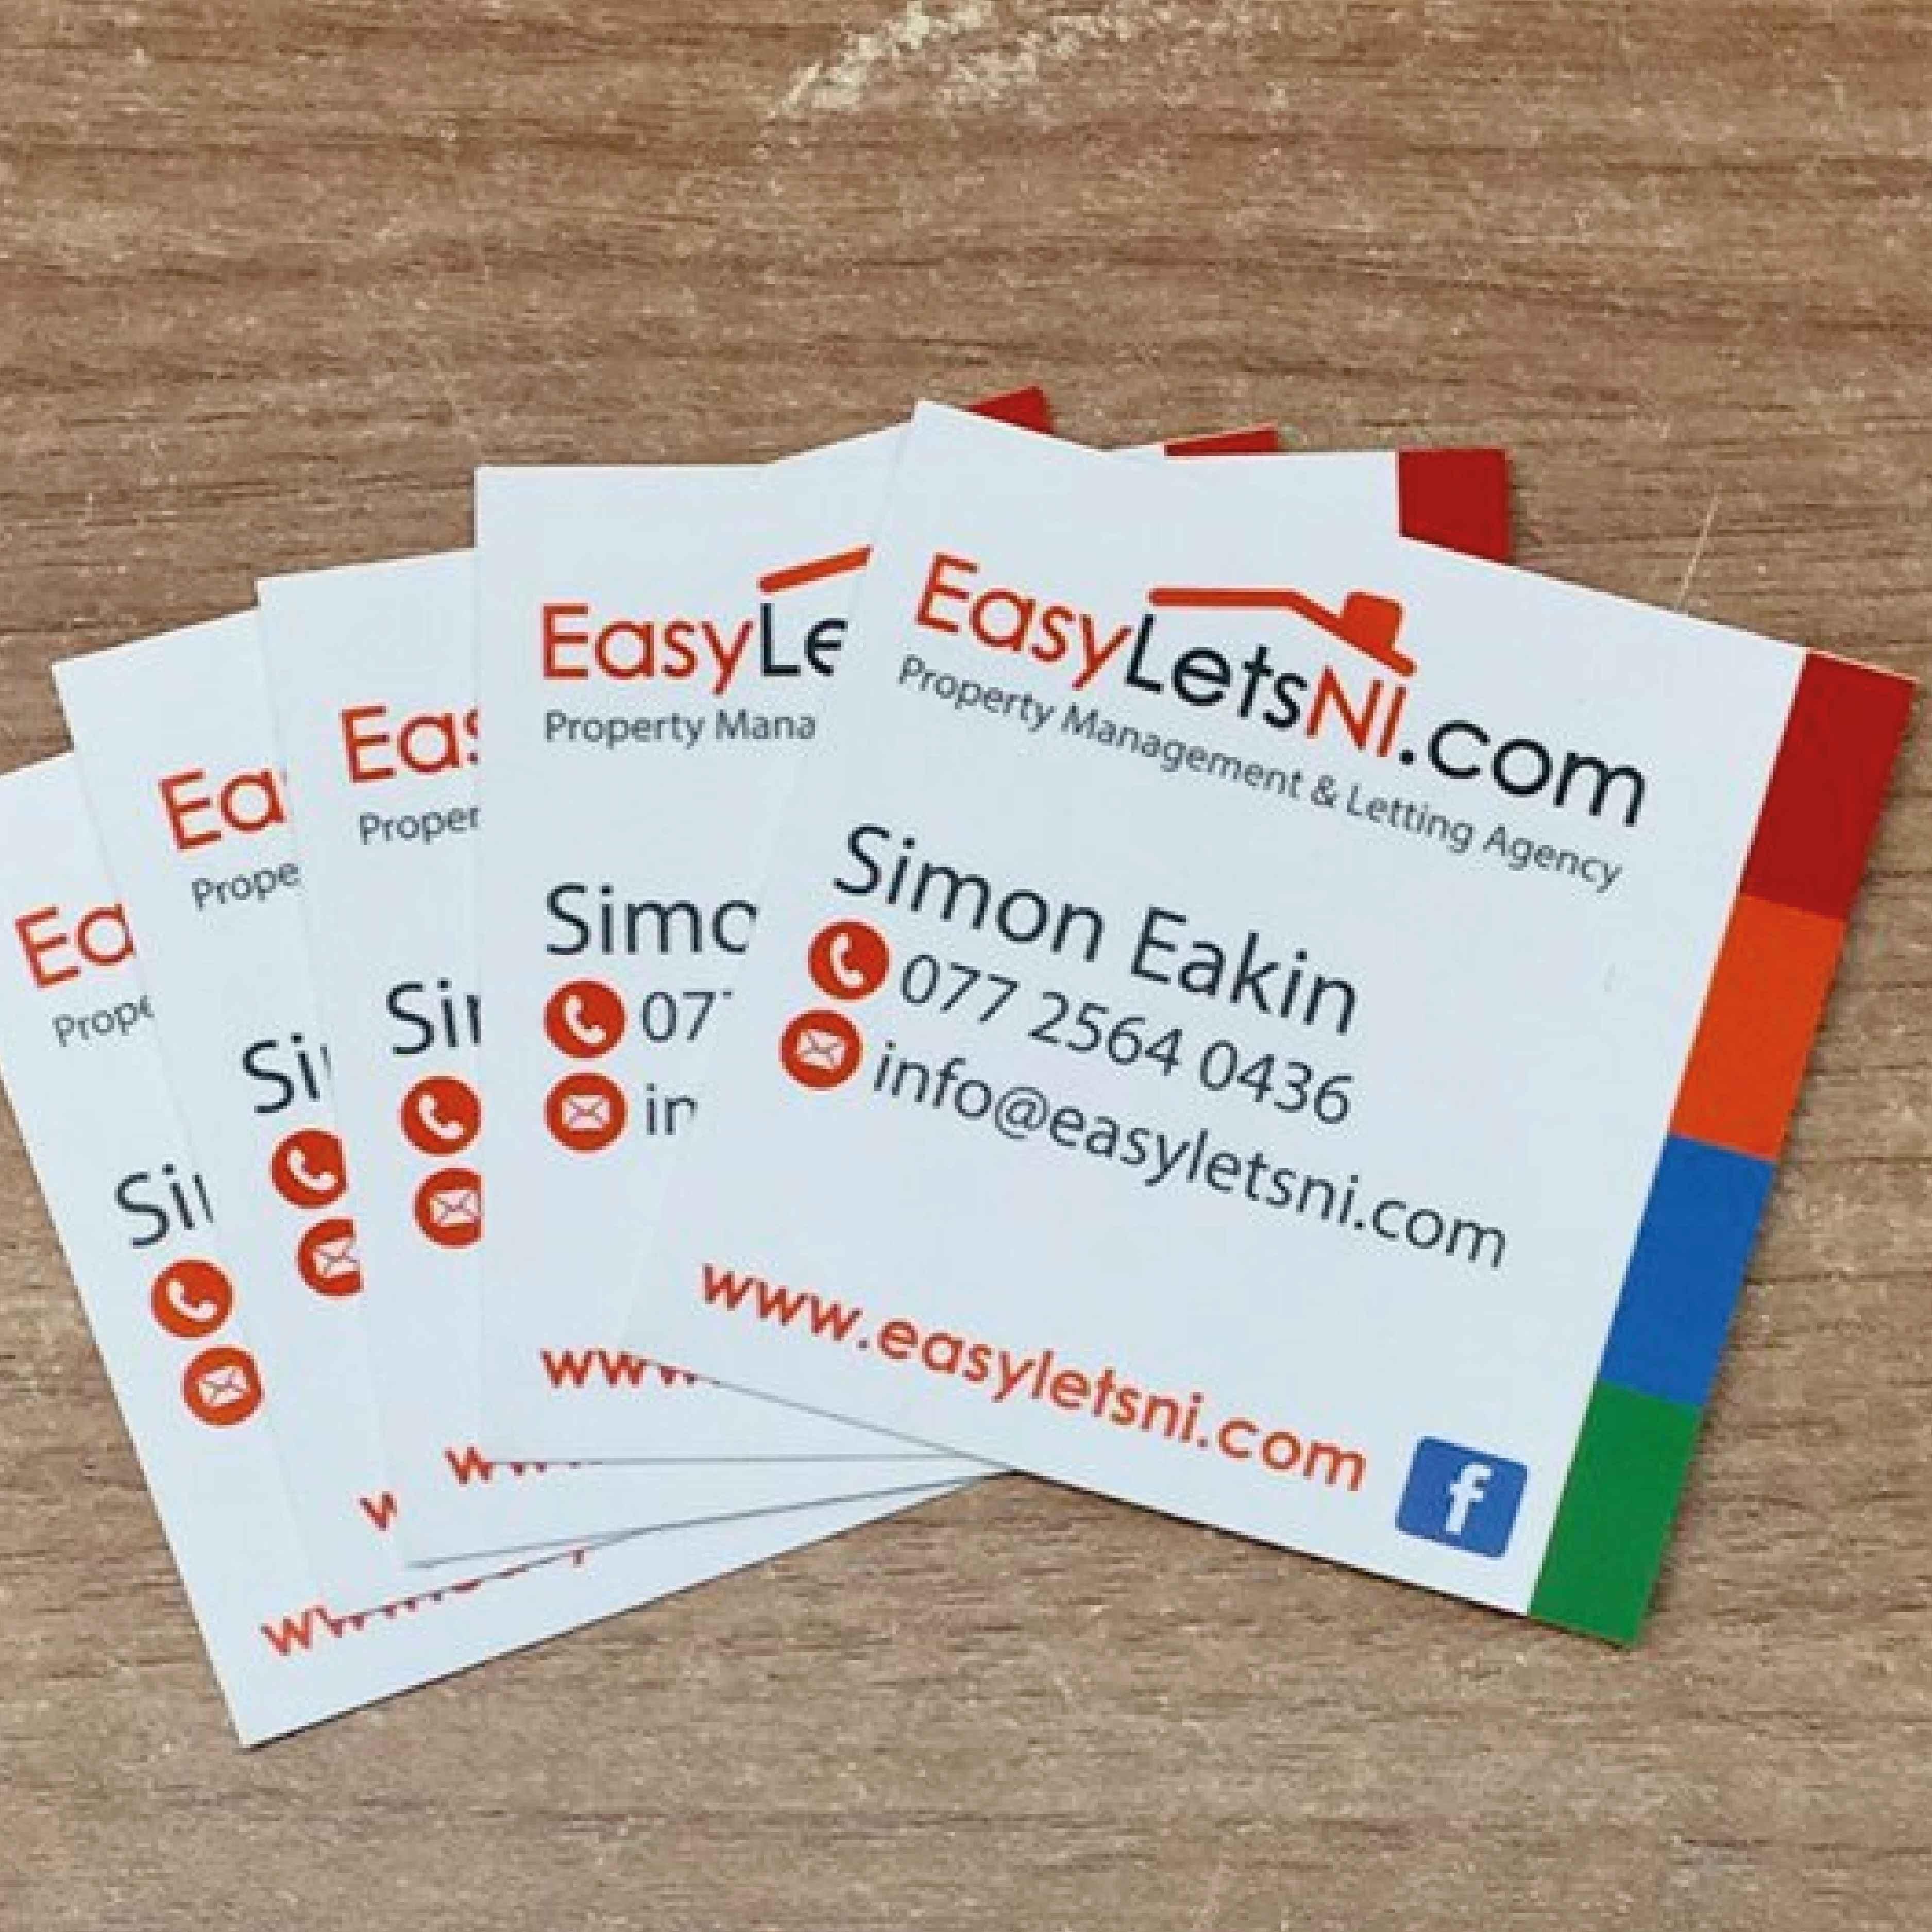 Business cards 30 web design graphic design logo design derry business cards 30 colourmoves